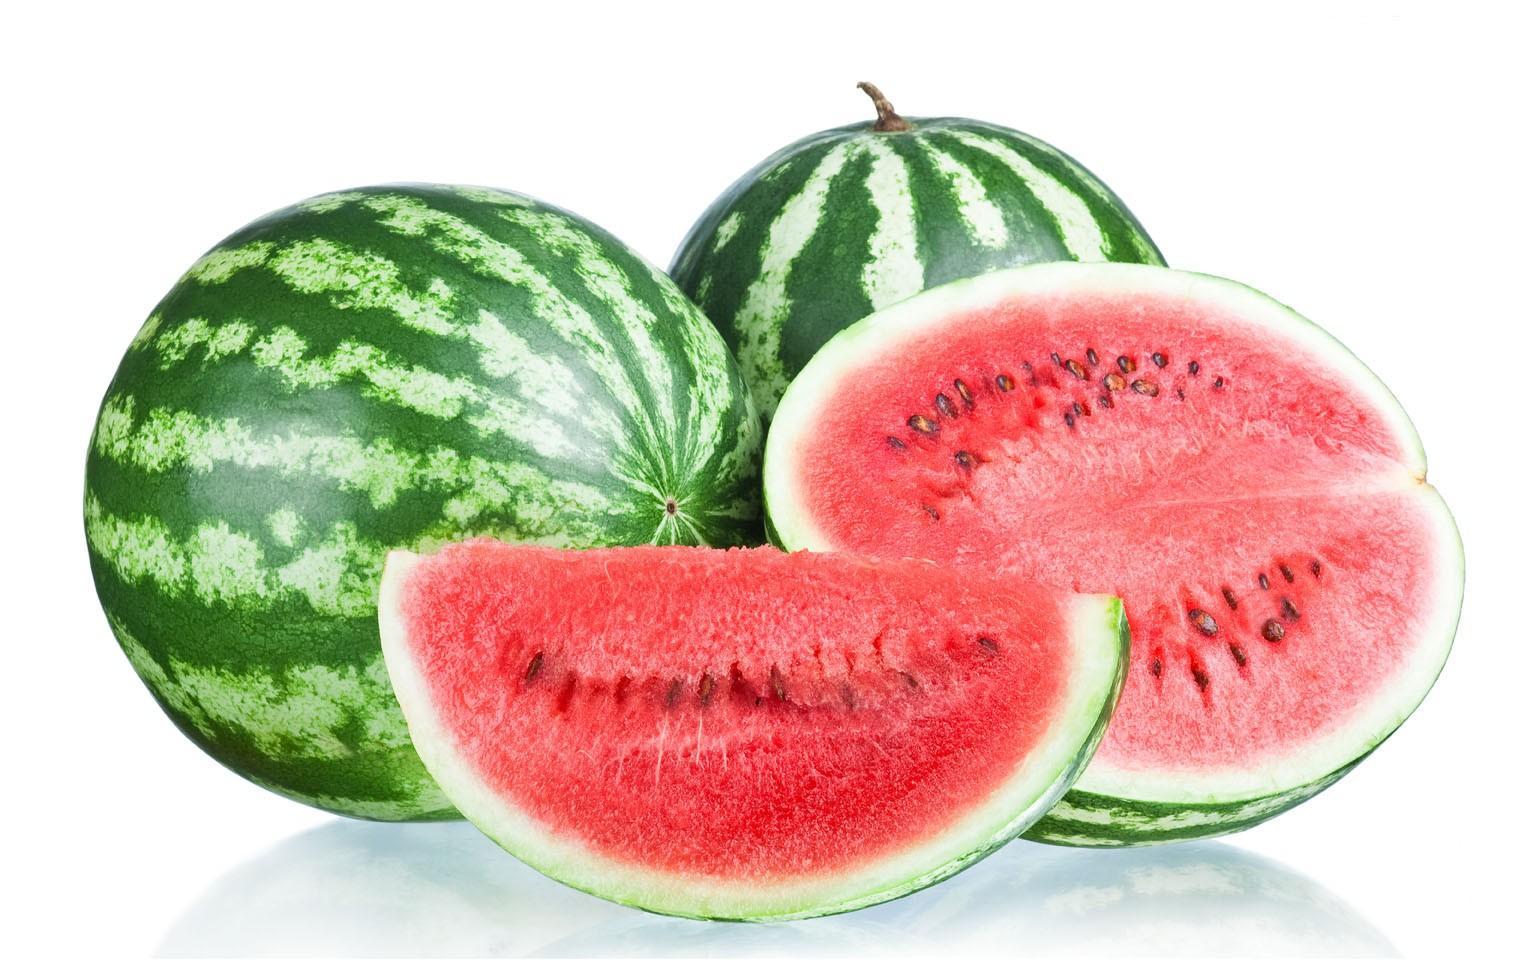 C:\Users\TOSHIBA\Desktop\xtremerain-watermelon.jpg